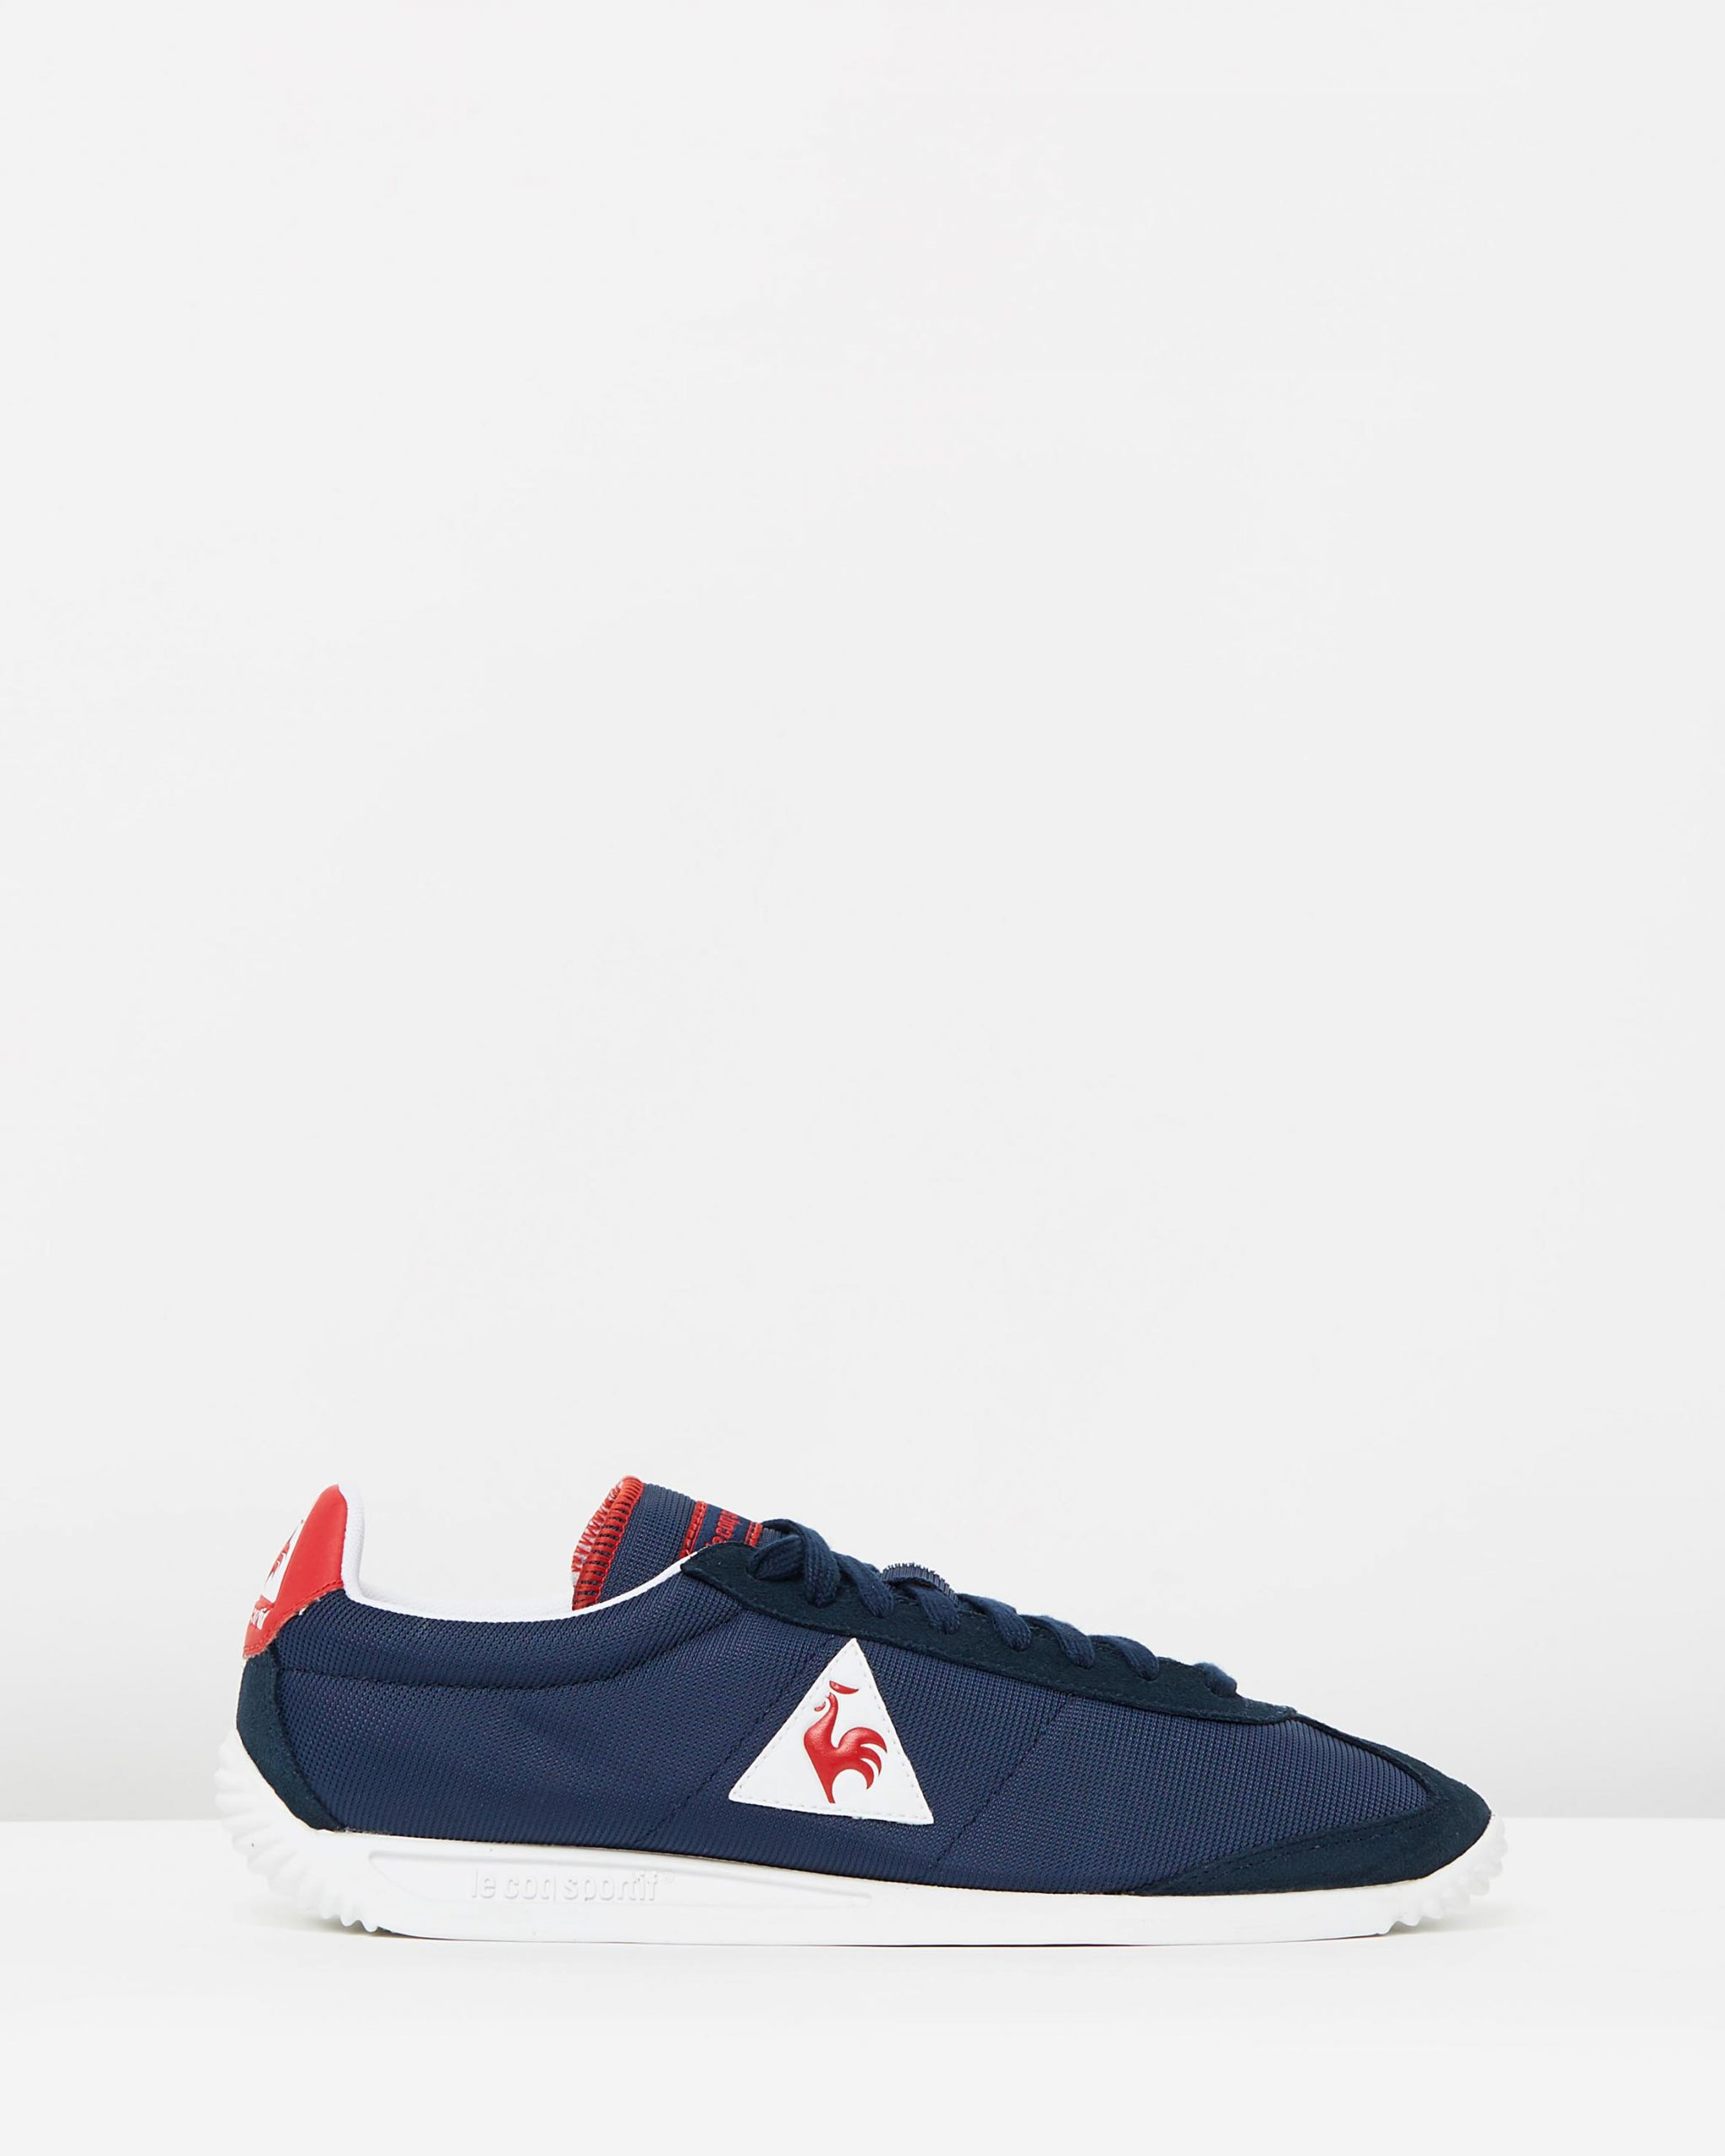 Le Coq Sportif Quartz Nylon Sneakers Dress Blue